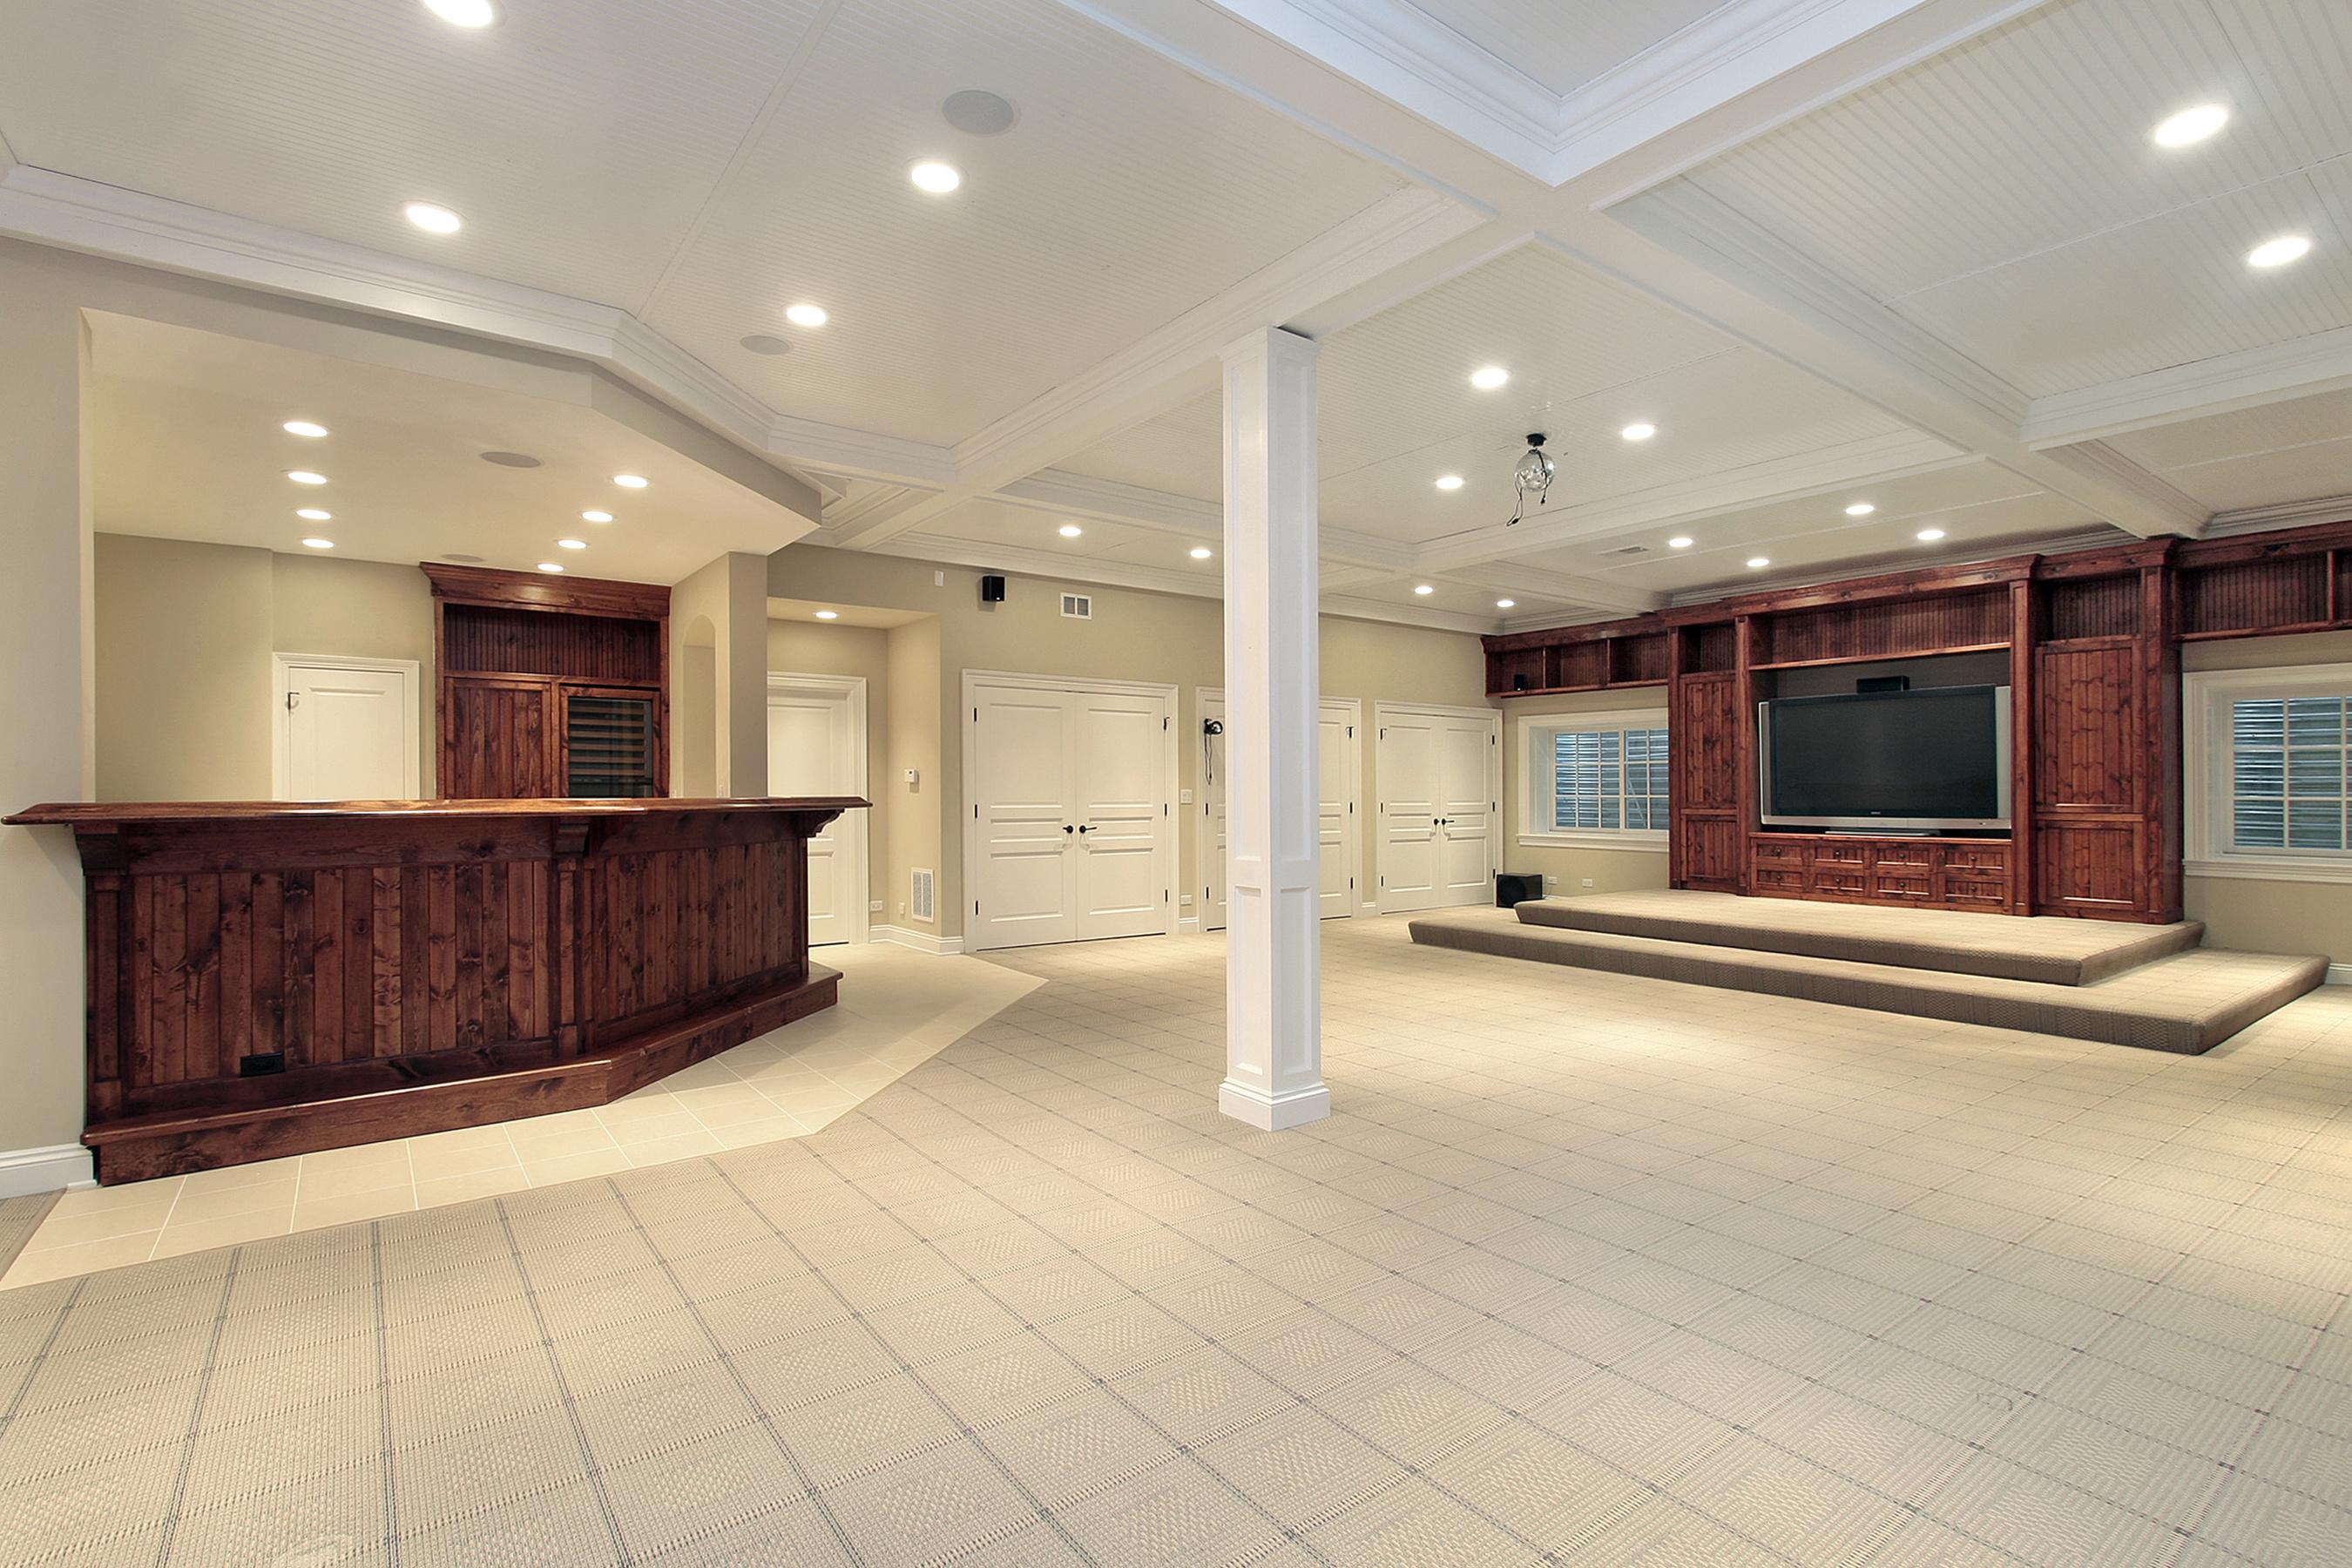 Luxurious basement remodel with hard wood bar, elegant carpet, multi closet storage, large entertainment cabinets and casket ceiling.